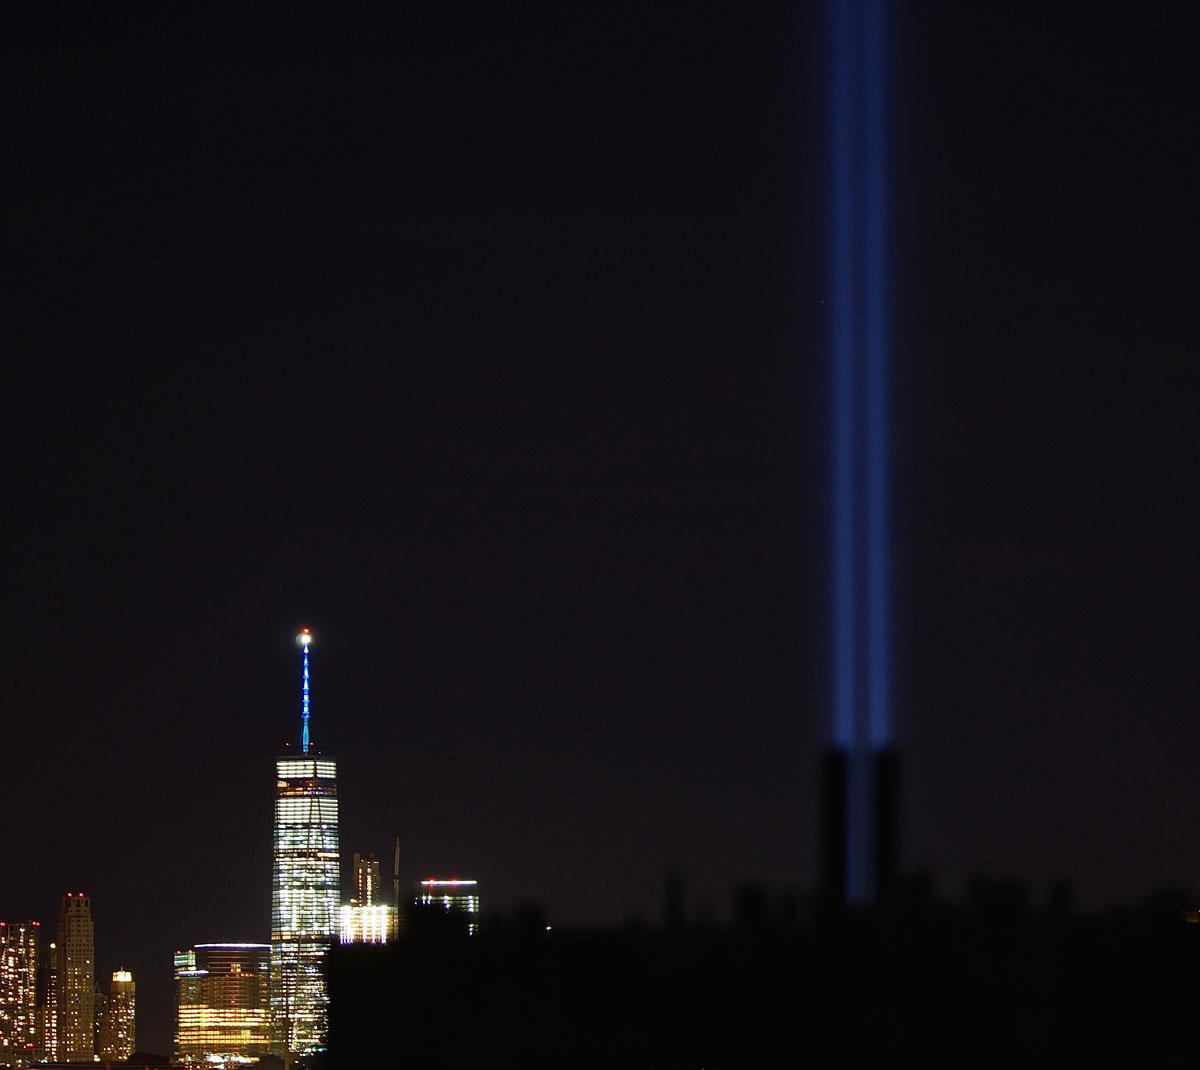 freedom-tower-dekorte-julia-fuhr-9-11-16-reduced